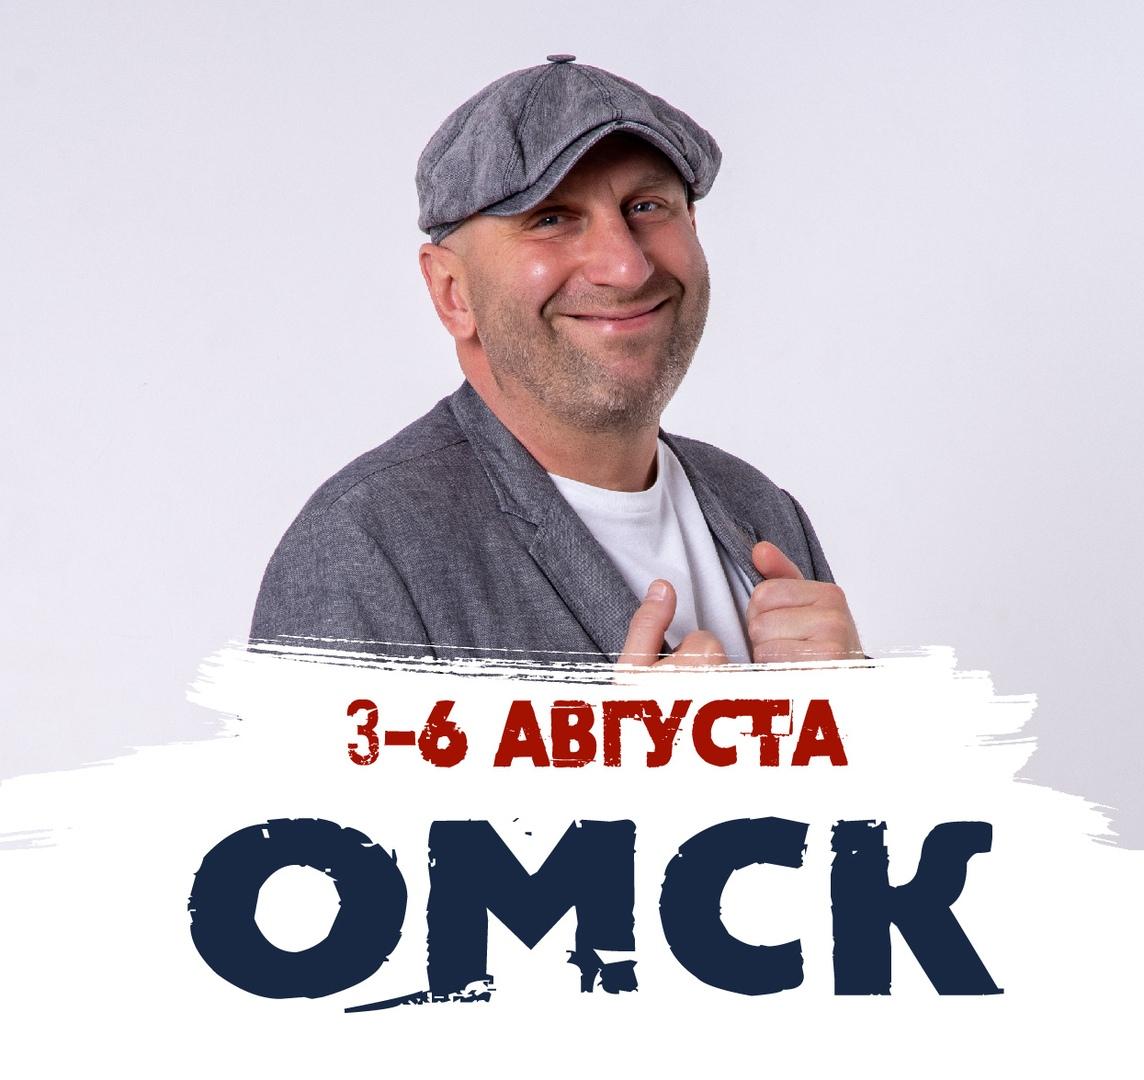 Афиша Омск Сатья в Омске 3-6 августа 2020